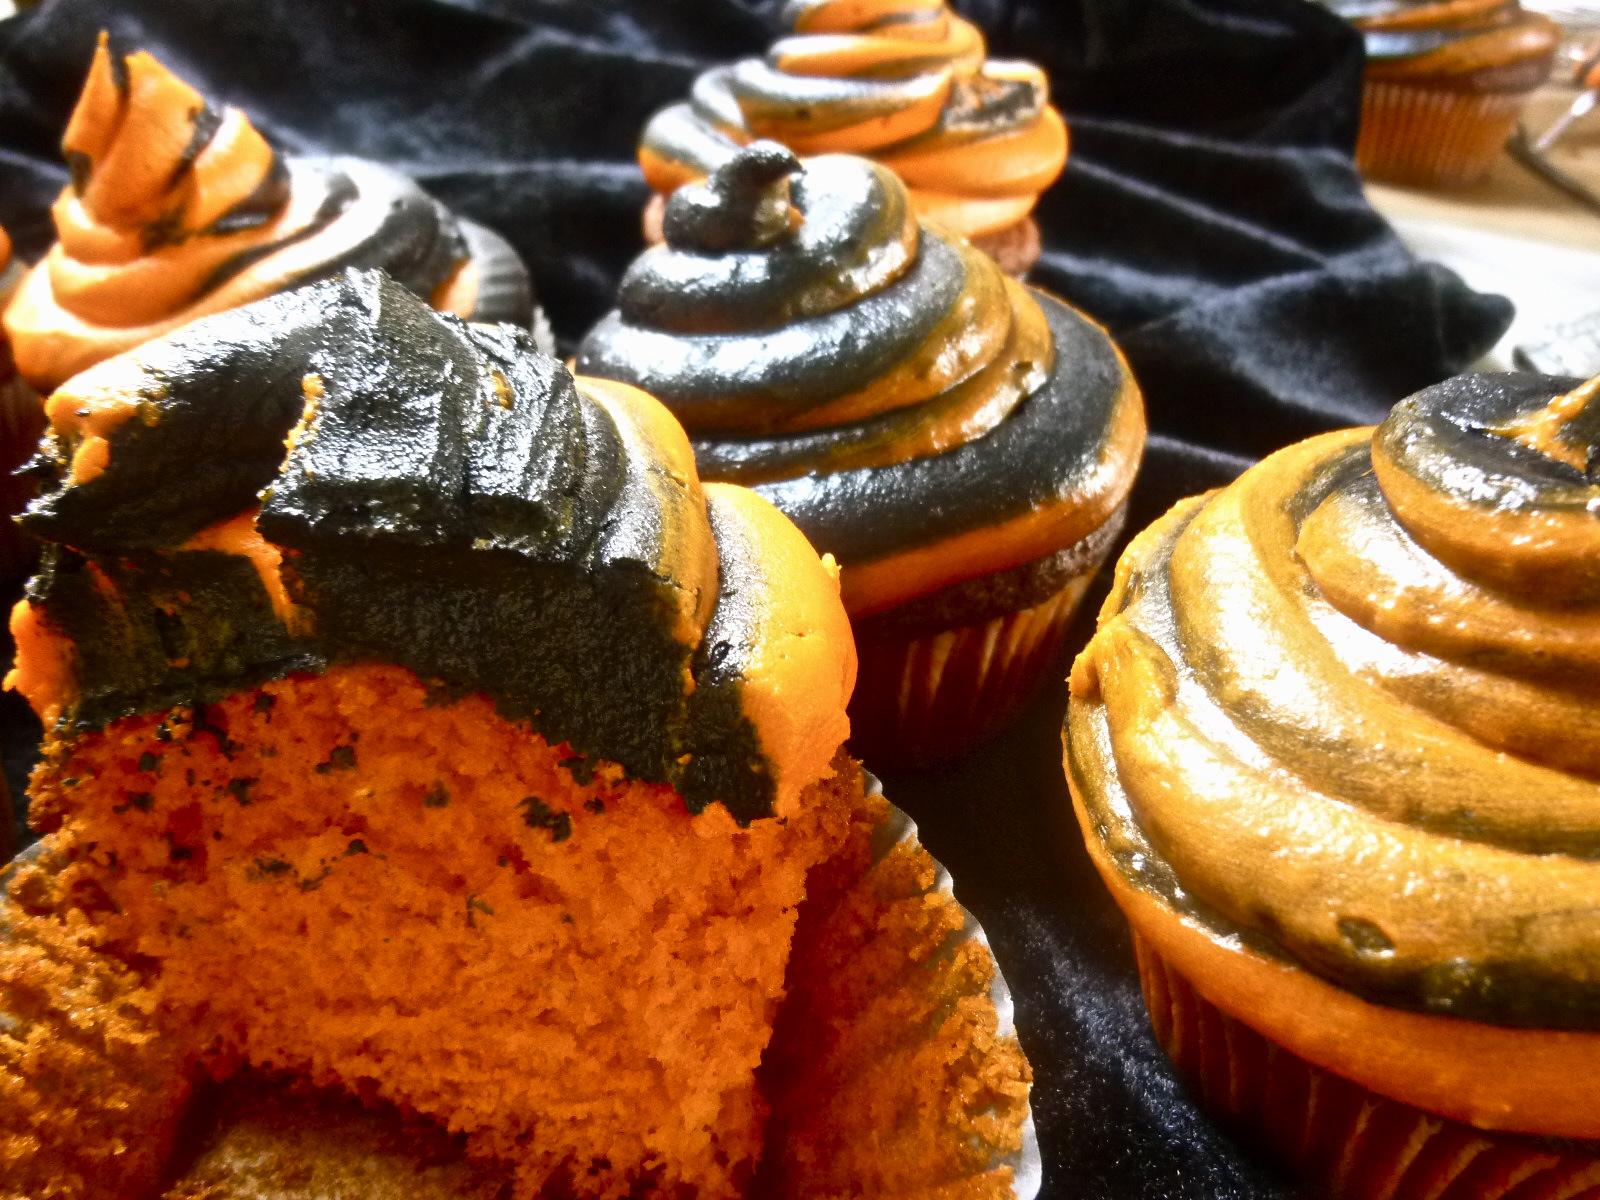 Red Velvet Cupcakes With Orange Buttercream Recipes — Dishmaps